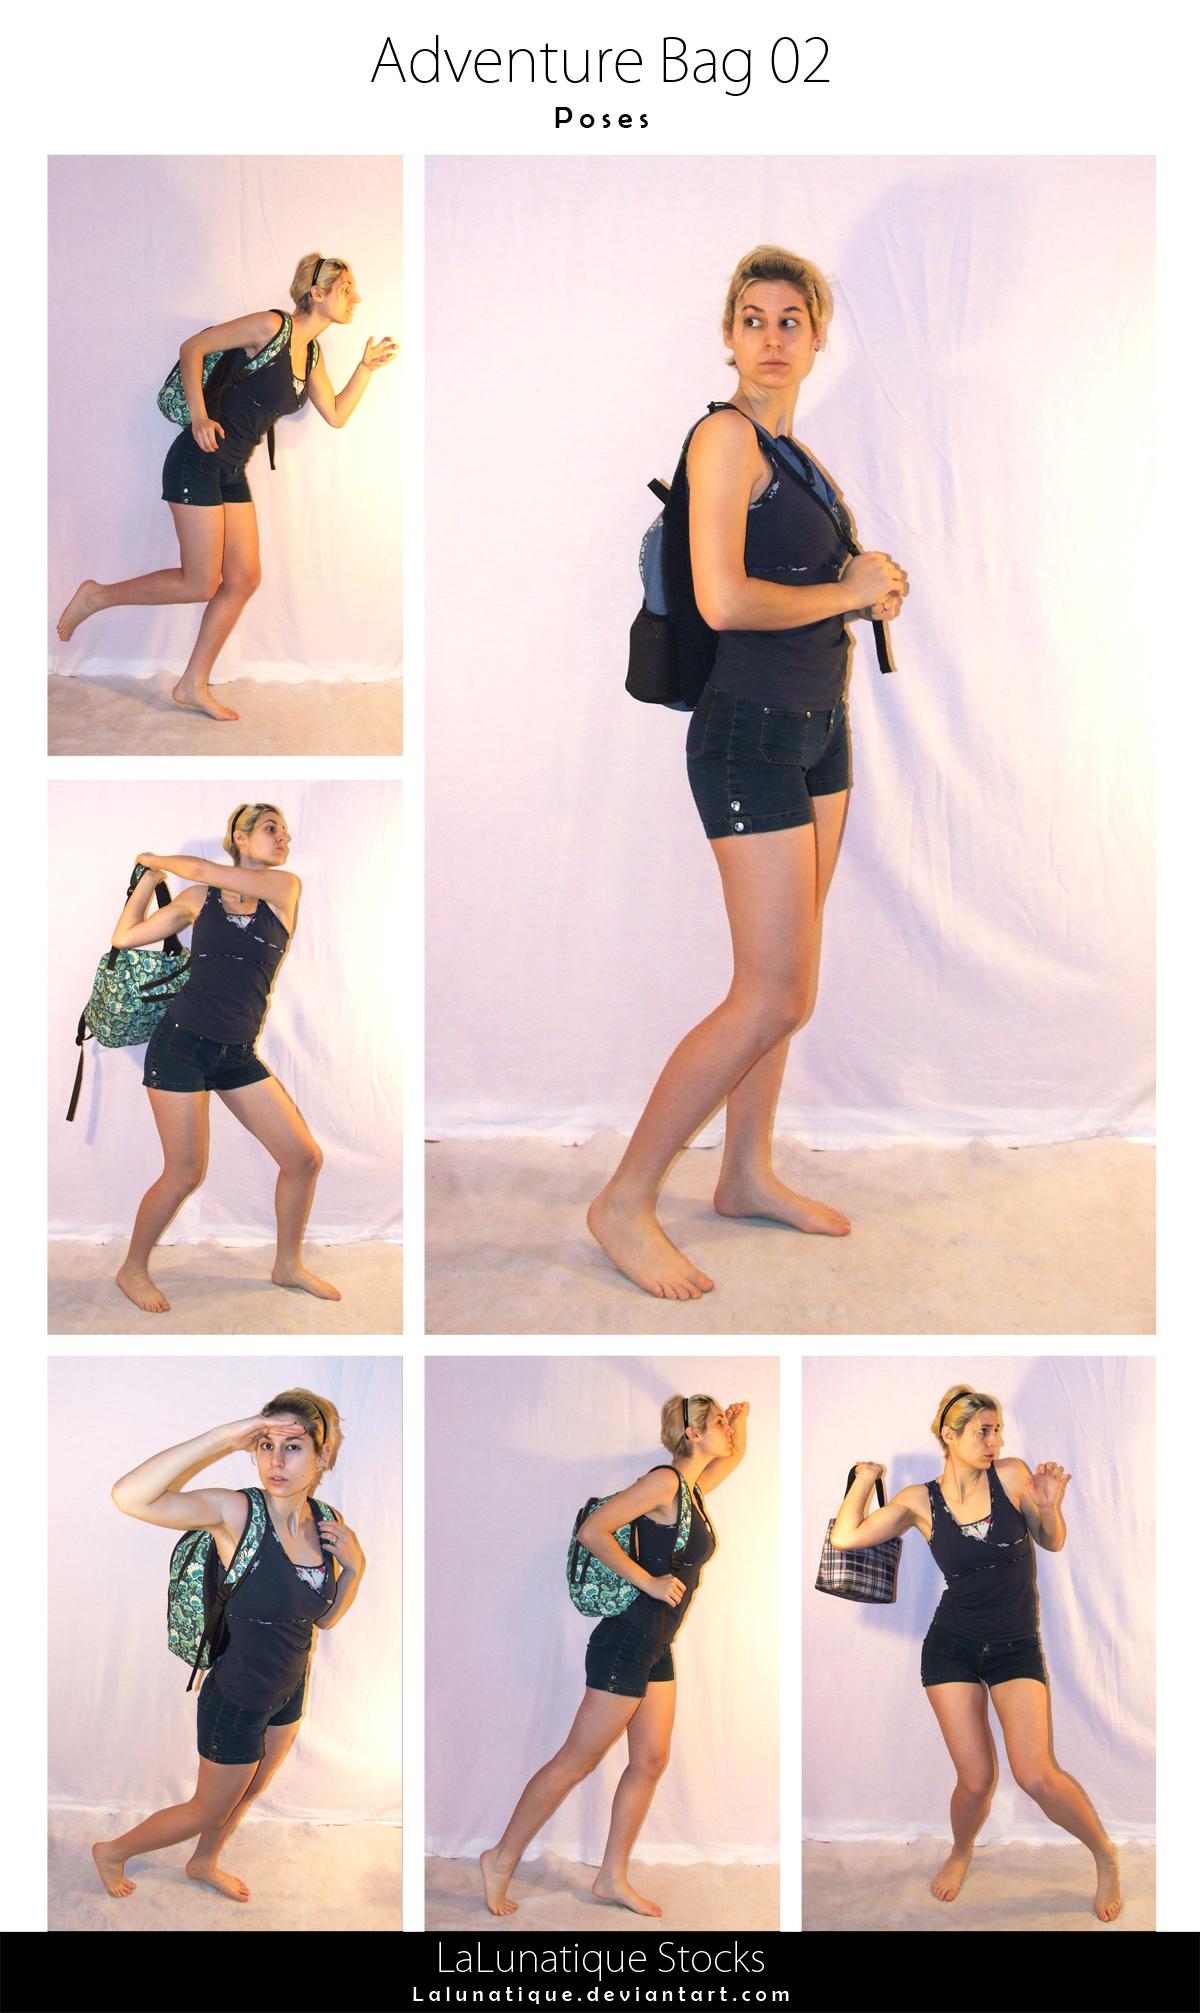 STOCK - Adventure Bag 02 by LaLunatique